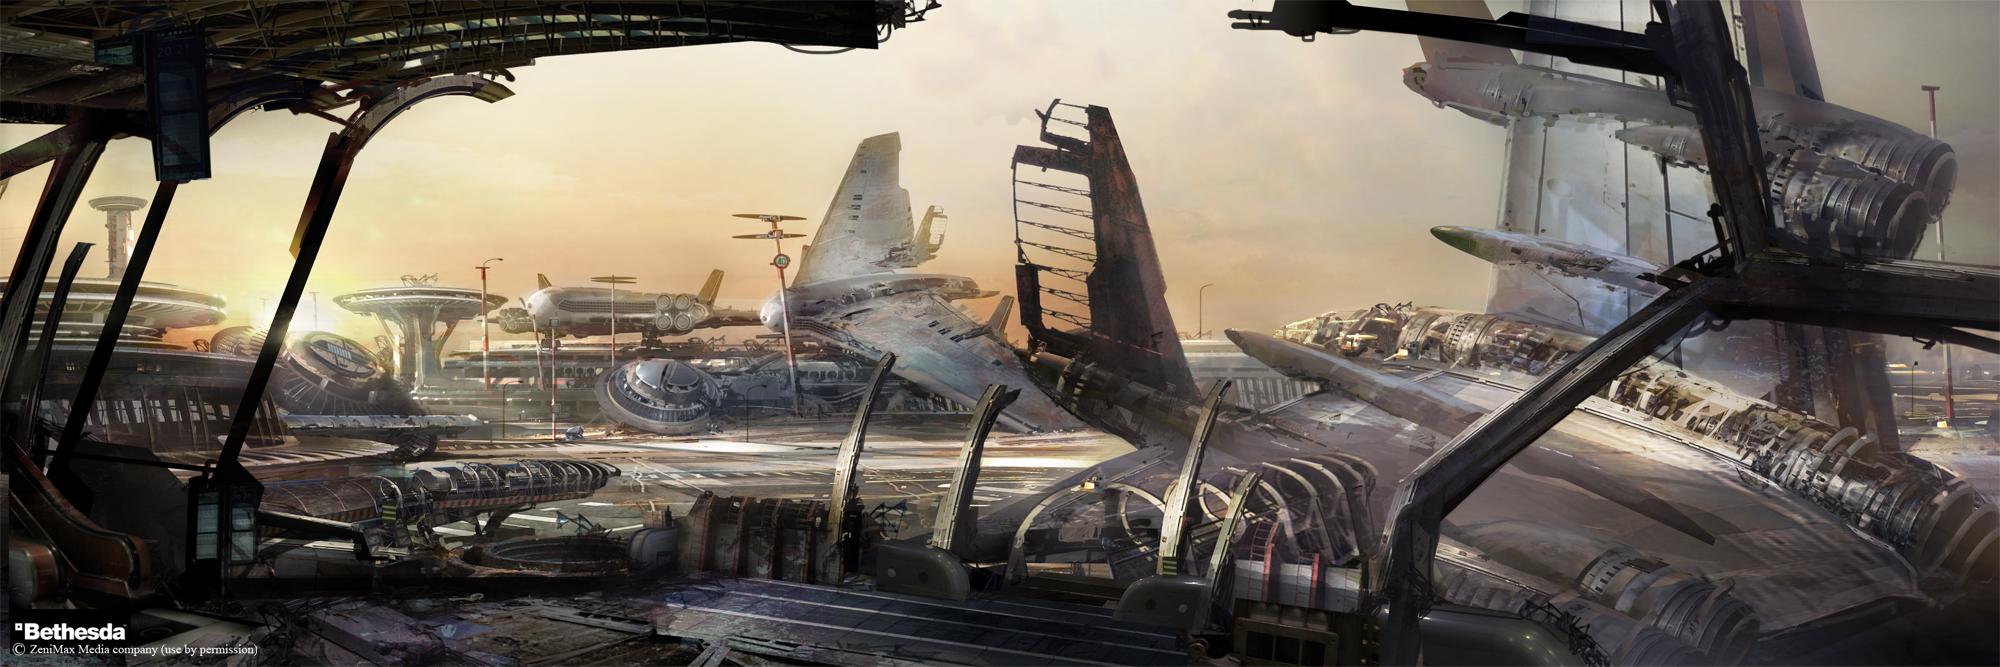 fallout 4 airport.jpg